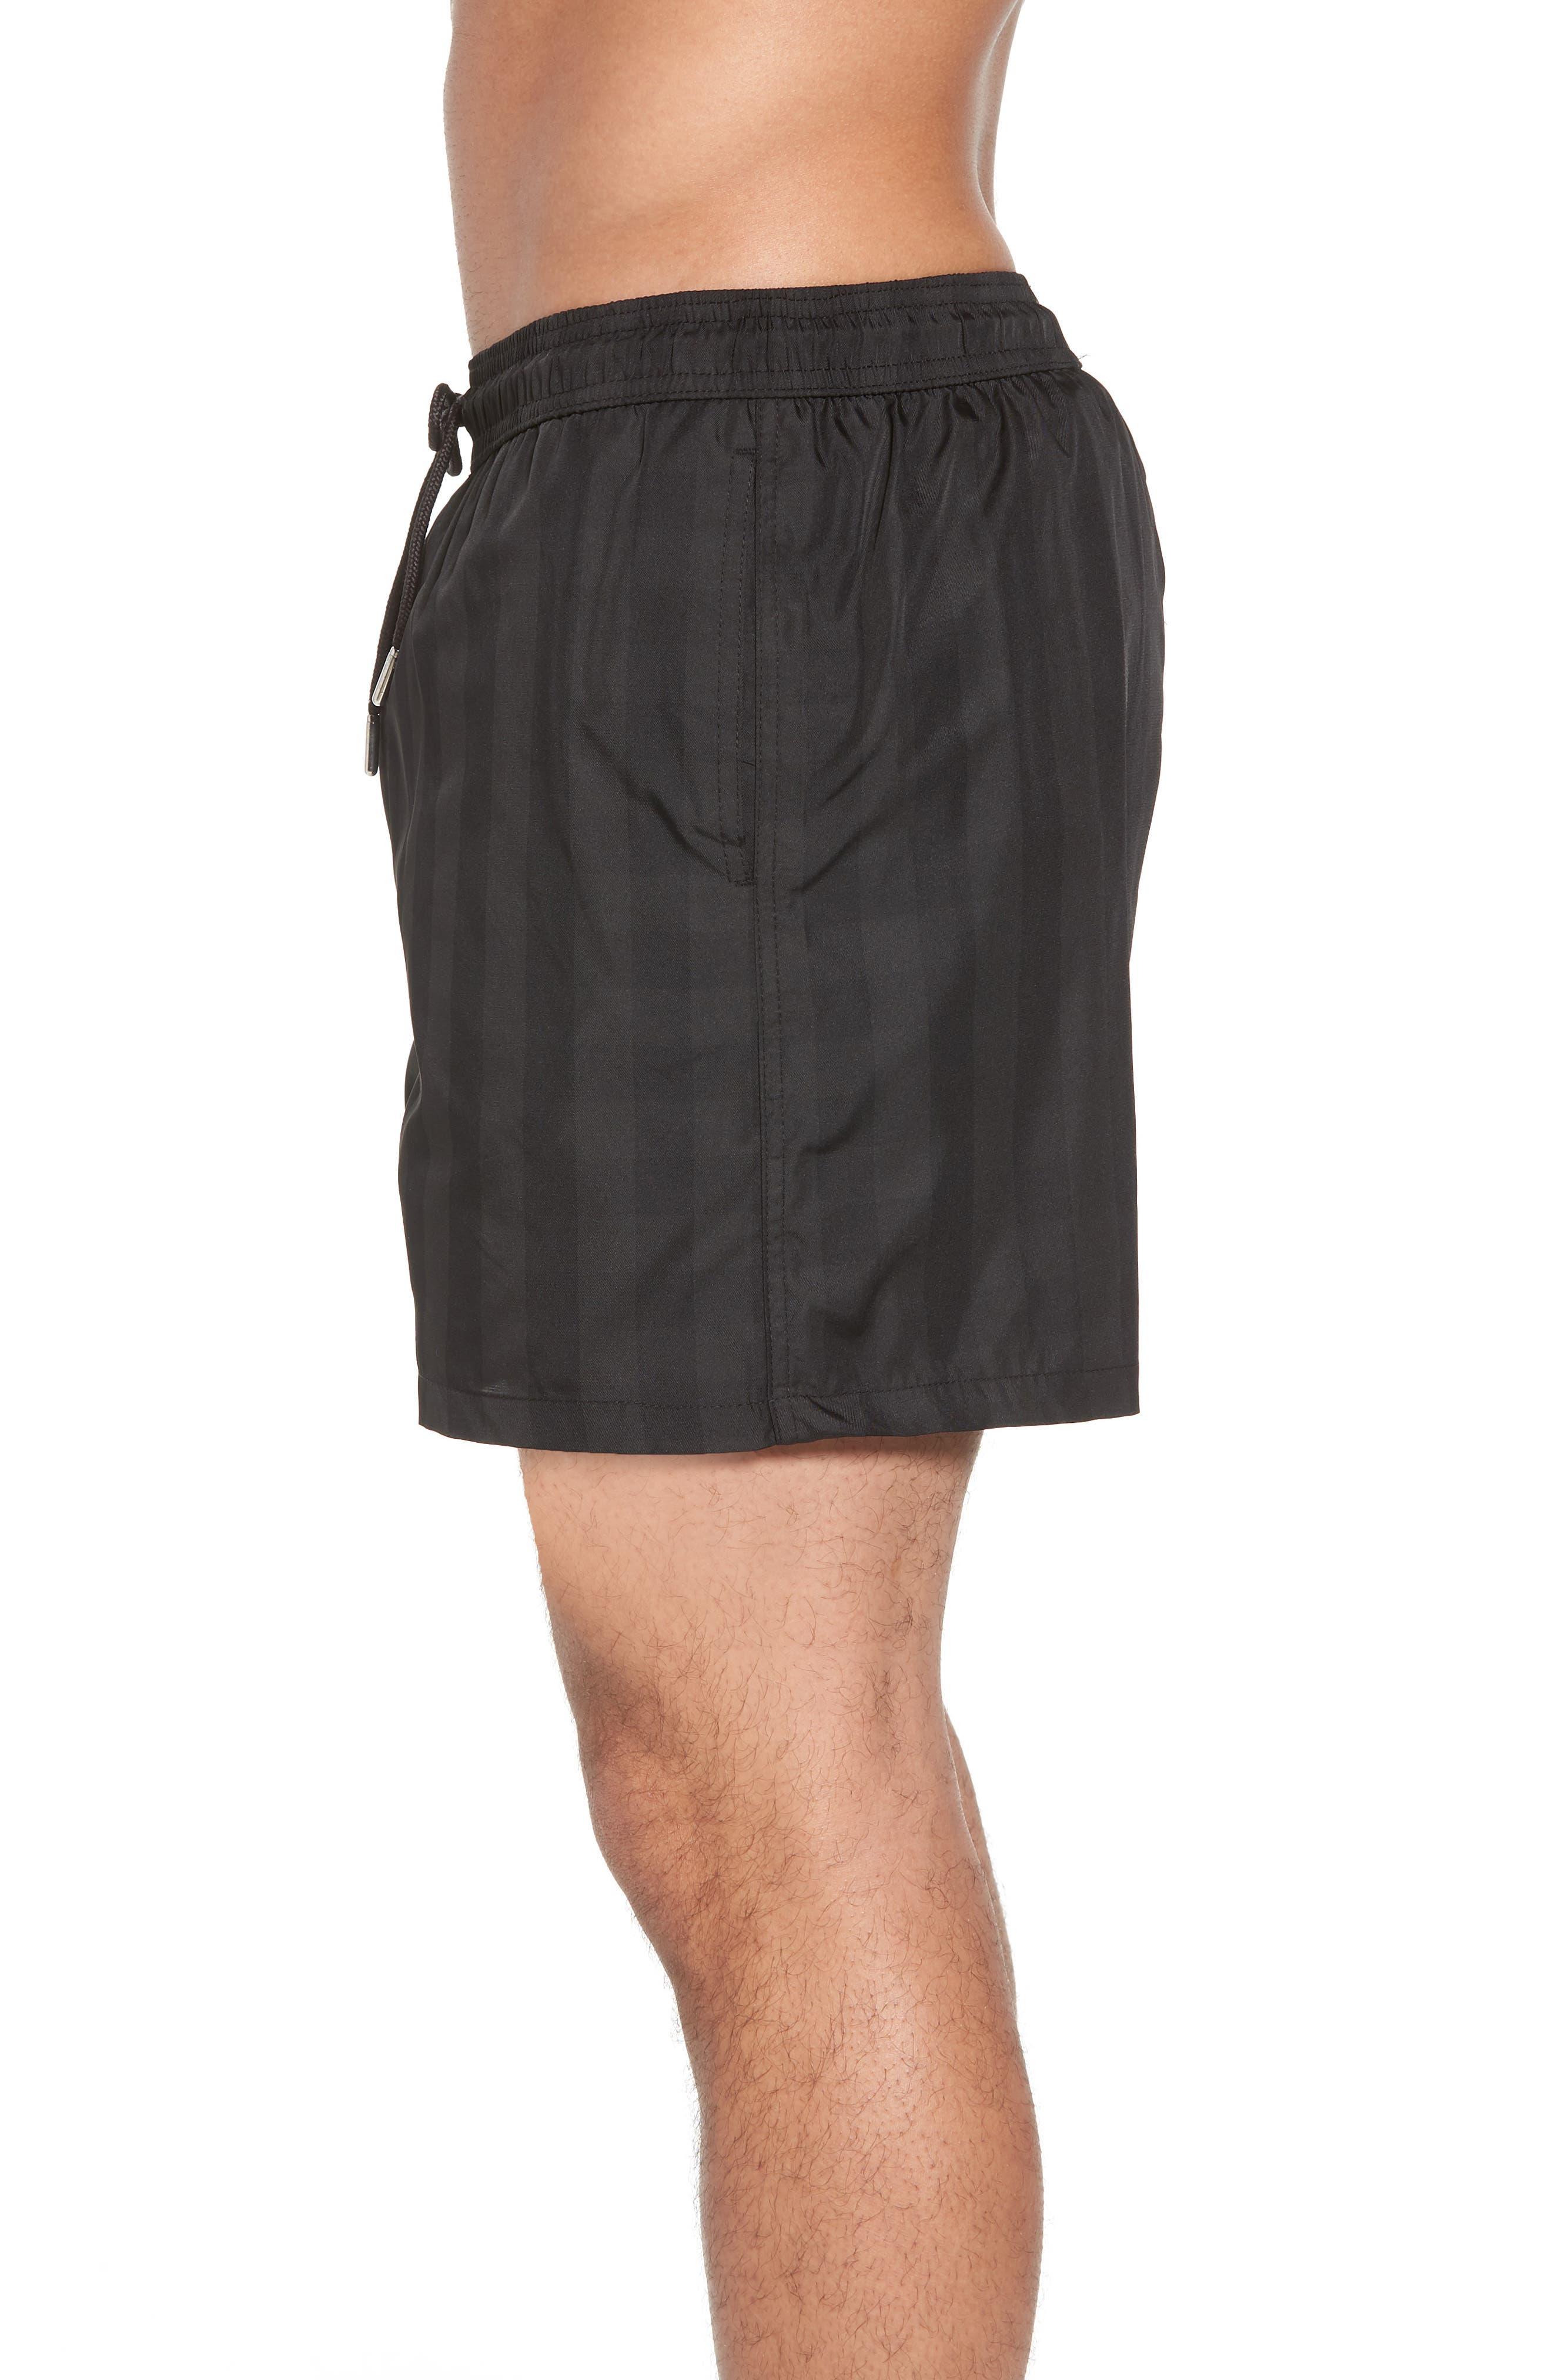 Trim Fit Swim Shorts,                             Alternate thumbnail 3, color,                             Black Plaid